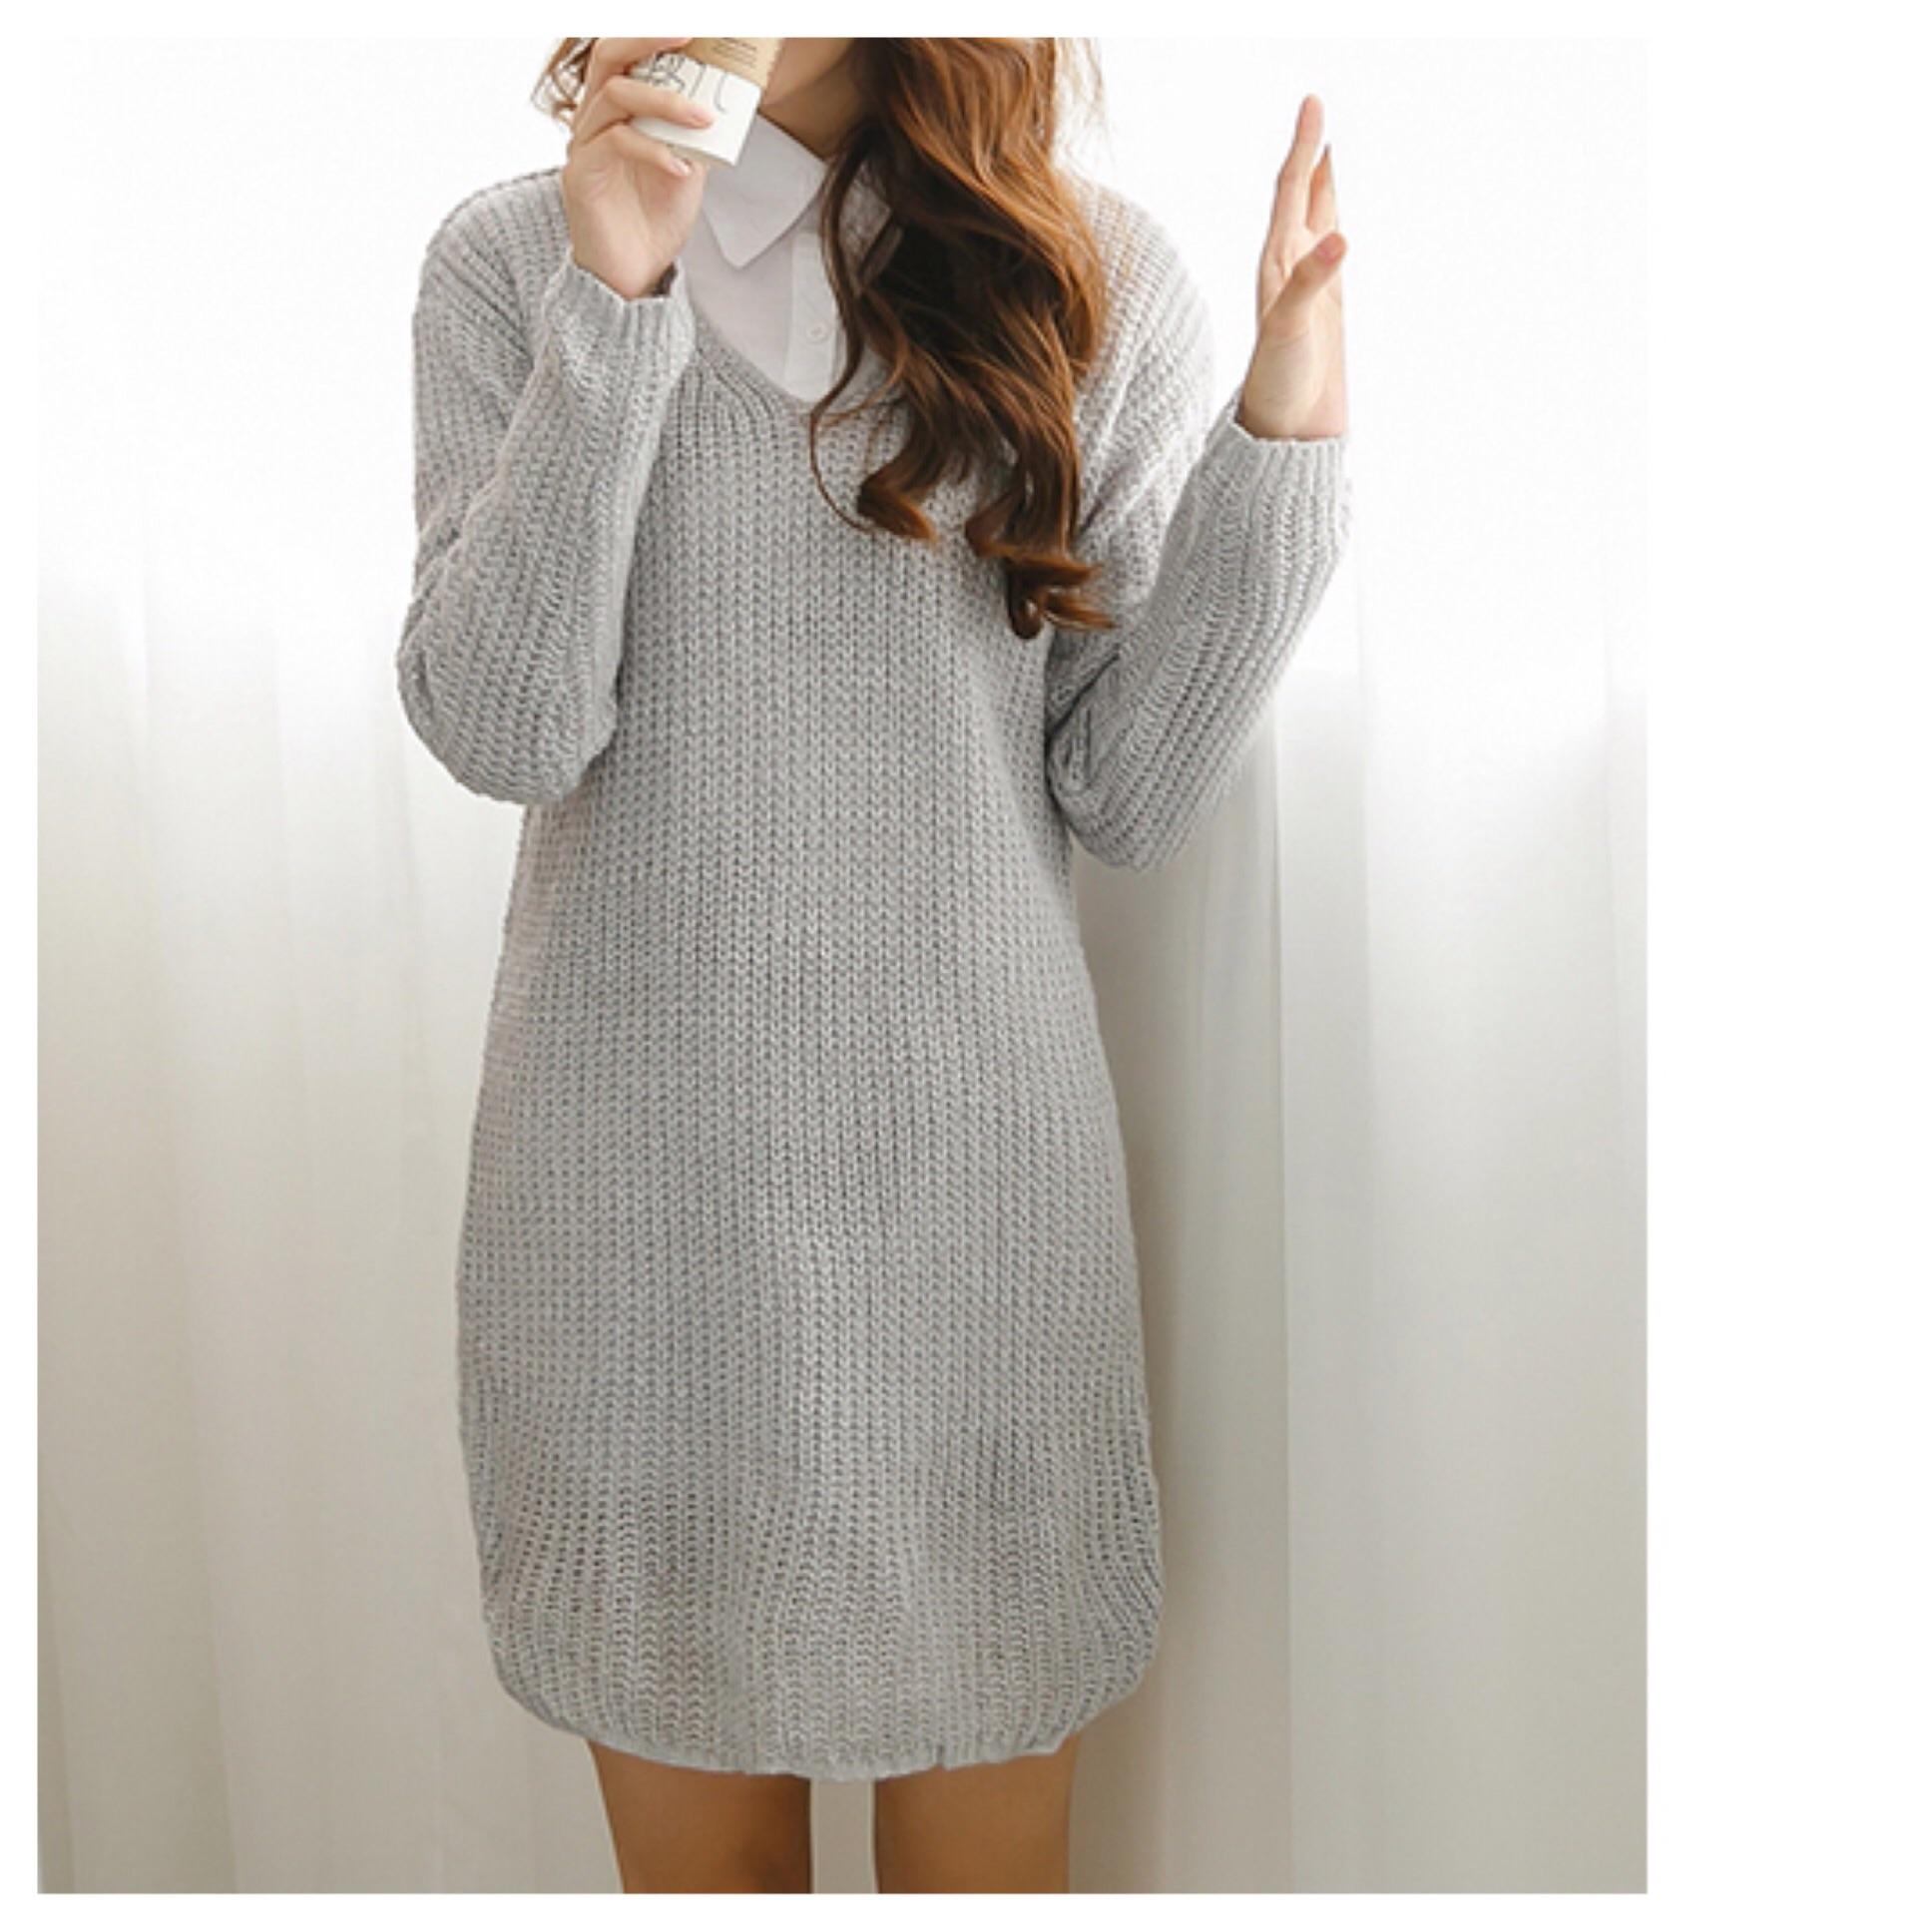 Amelia sweater dress from doublelw on storenvy